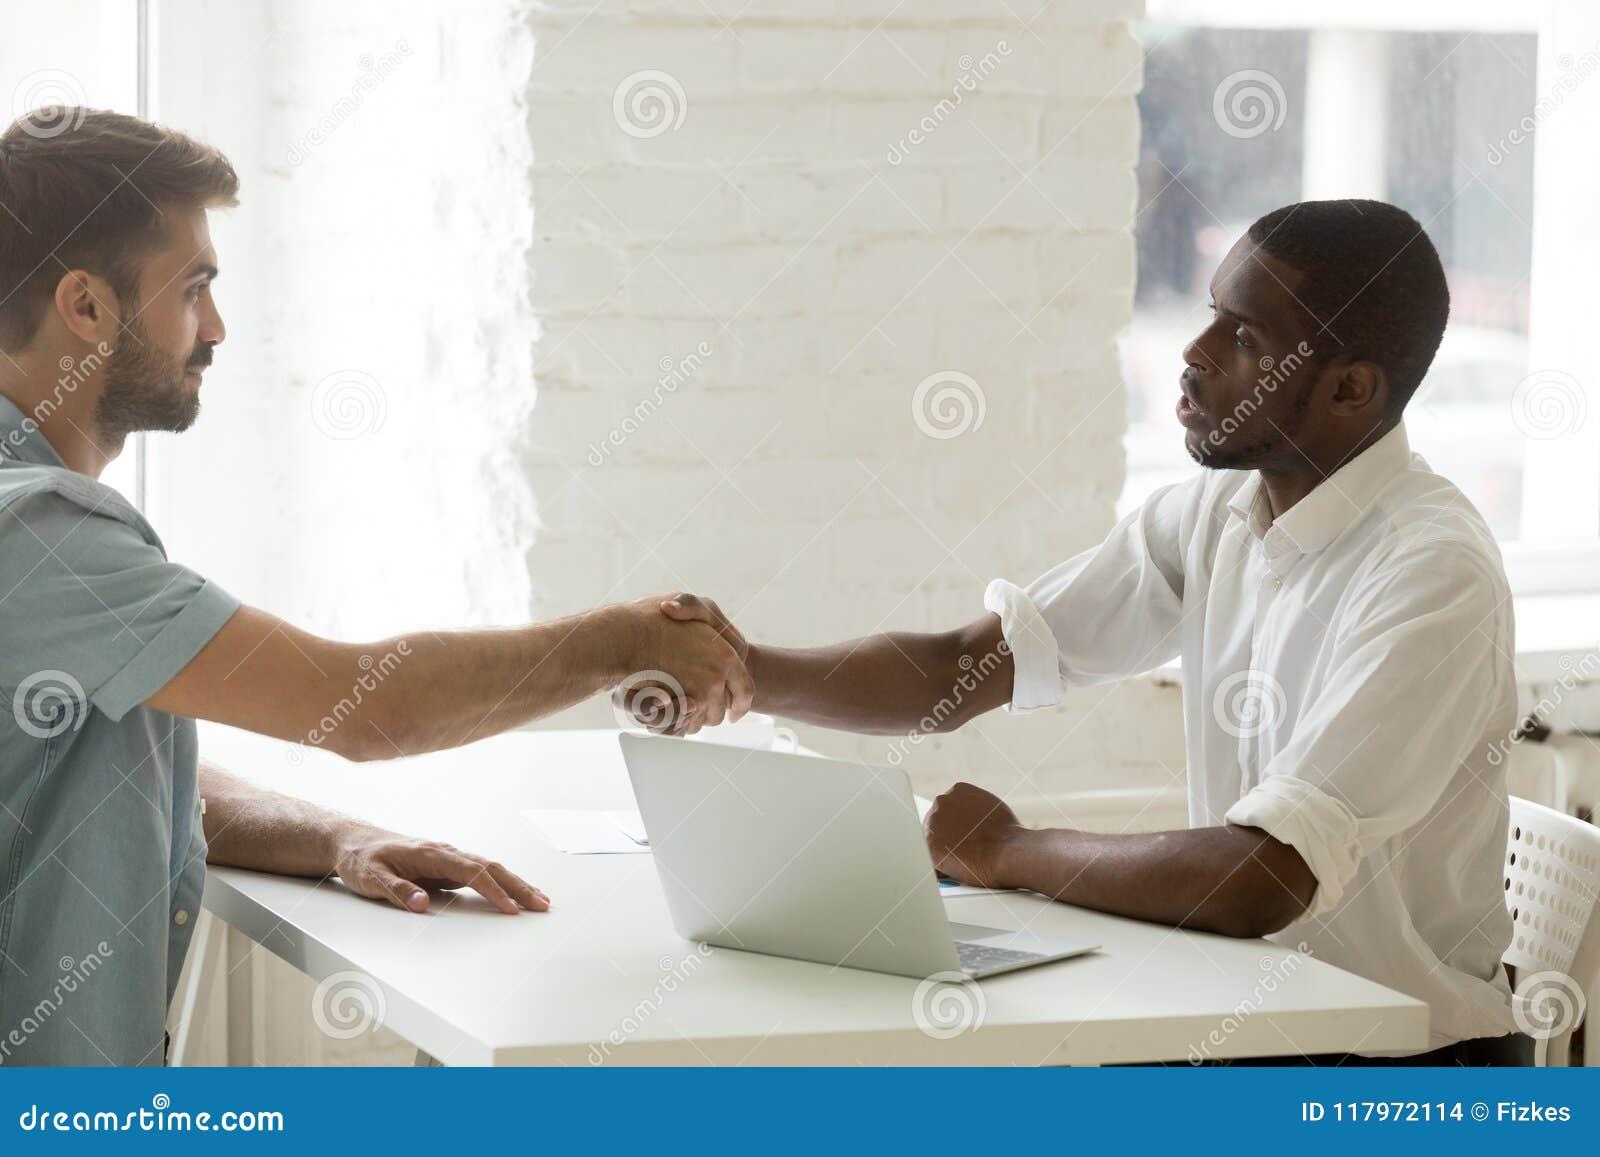 Serious Black Boss Greeting Caucasian Candidate With Handshake Stock